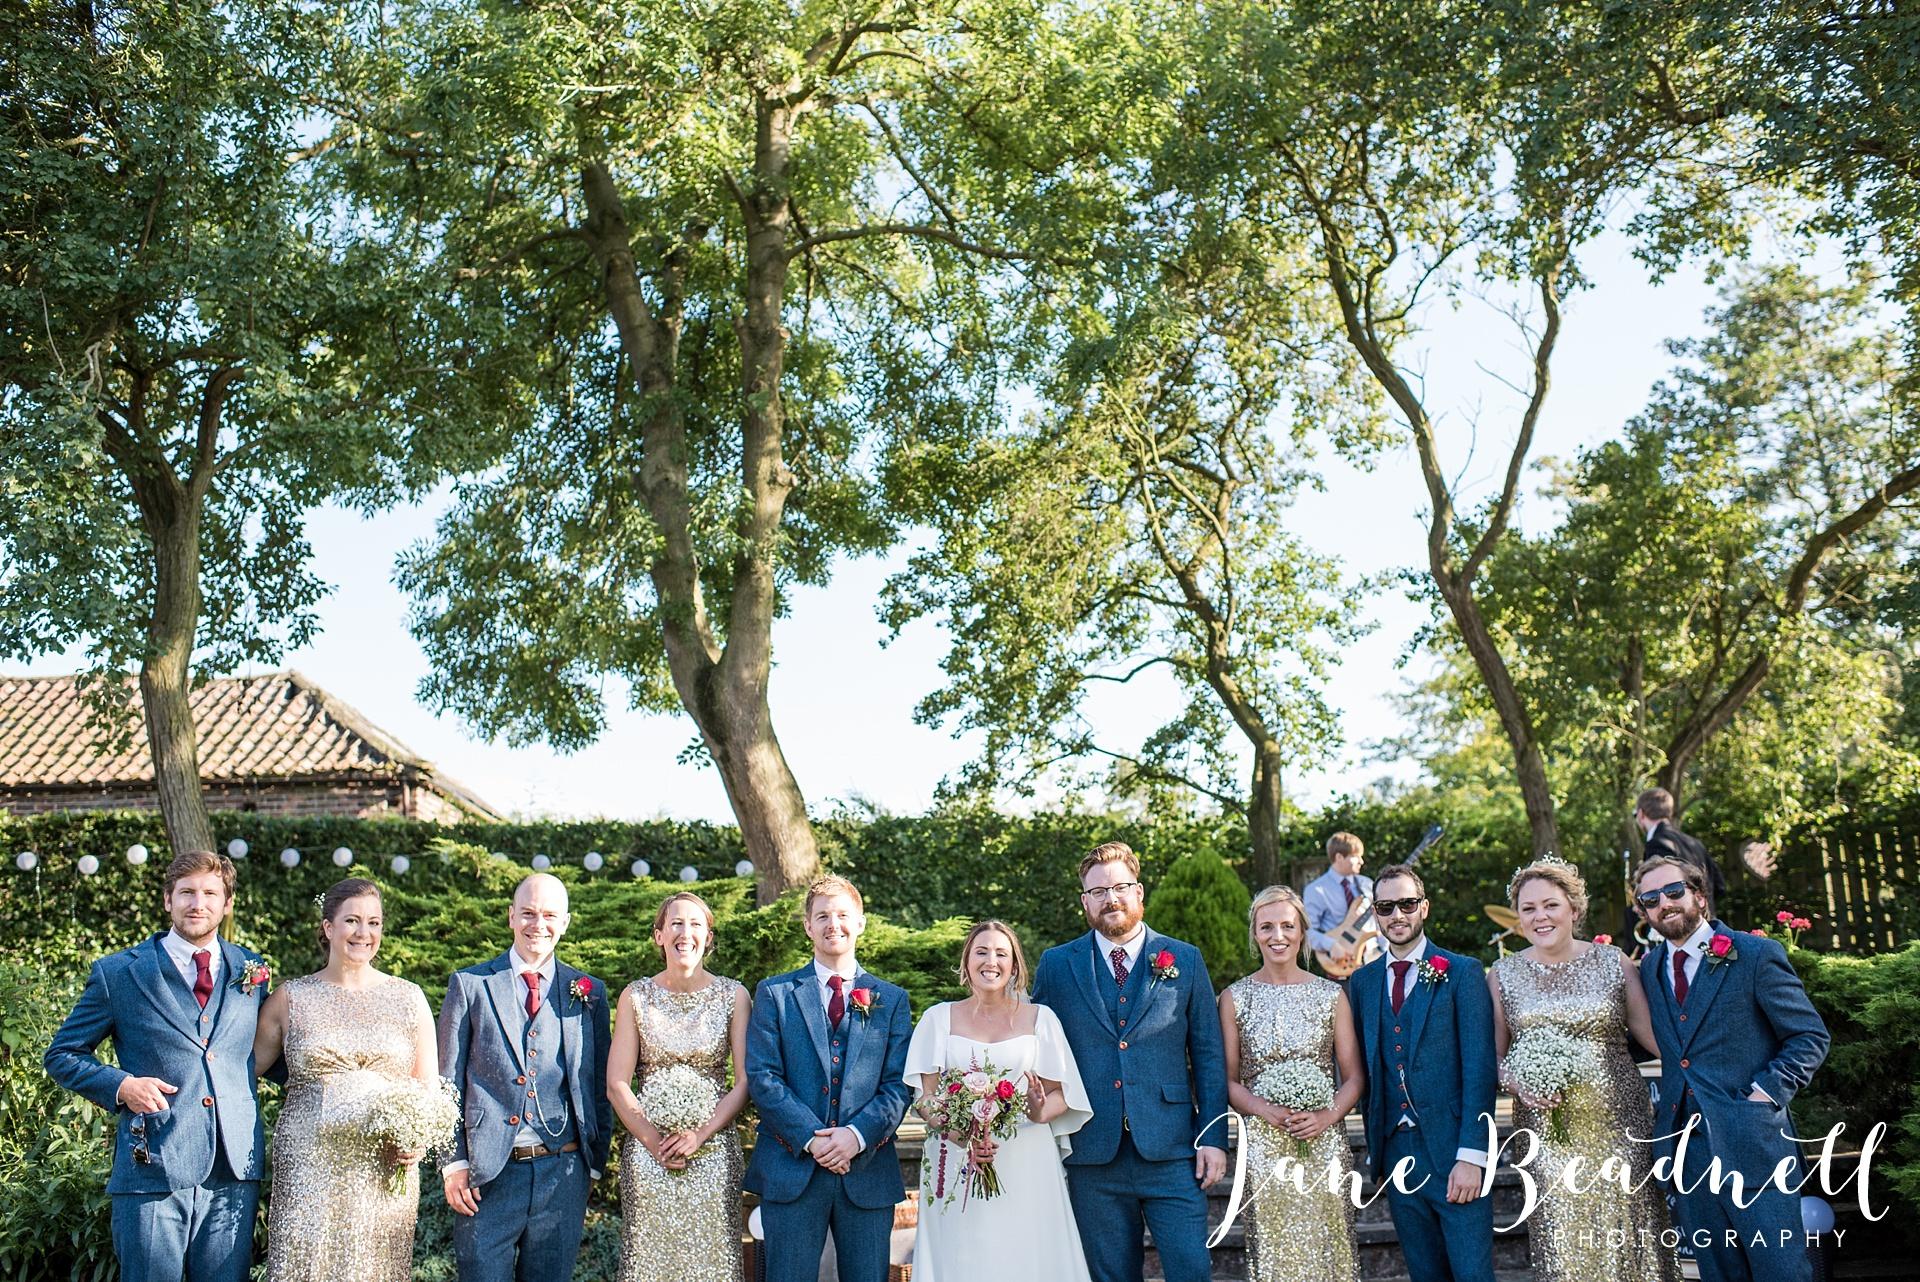 fine-art-wedding-photographer-jane-beadnell-yorkshire-wedding-photographer_0114